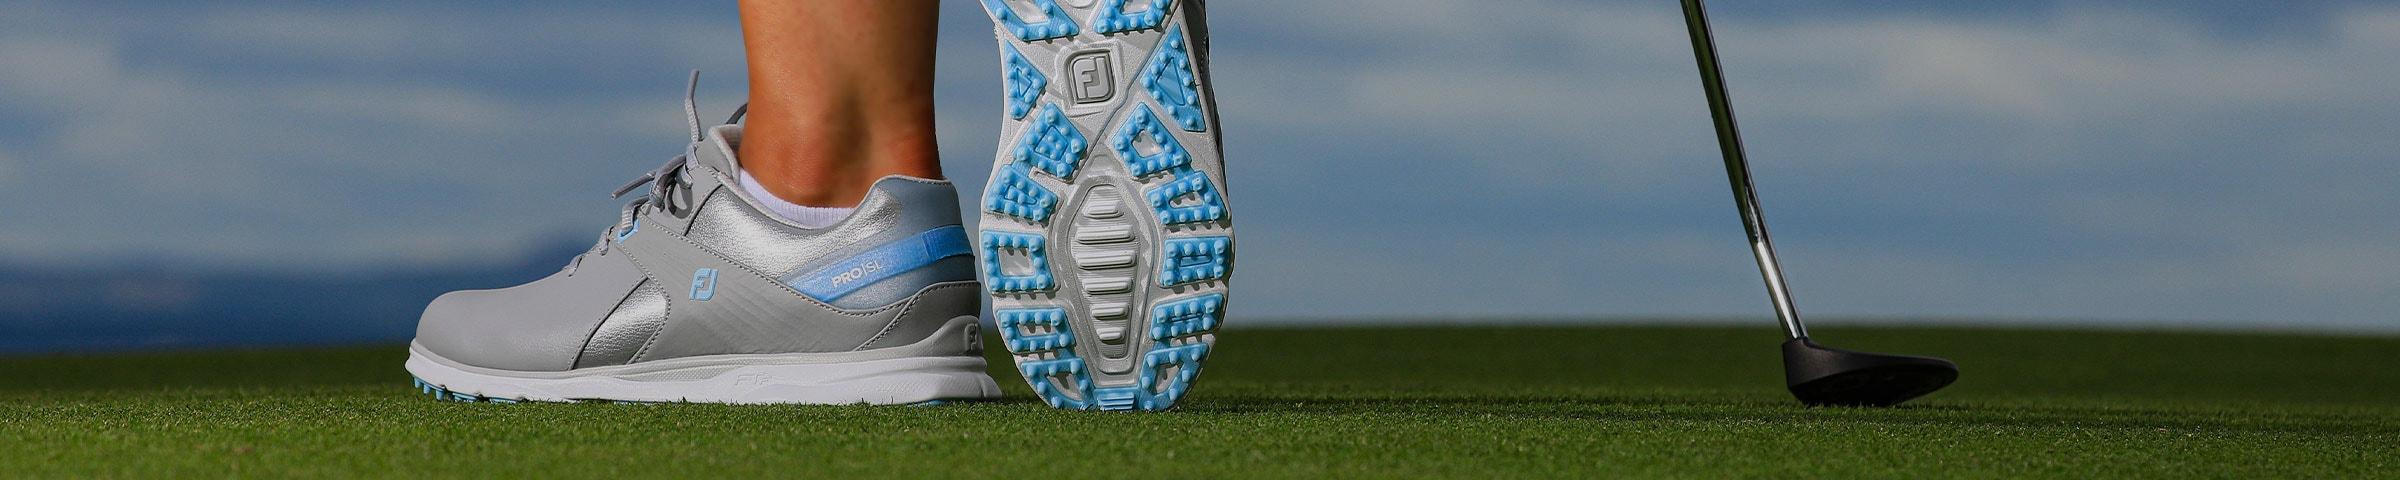 FootJoy Womens Spikeless Golf Shoes